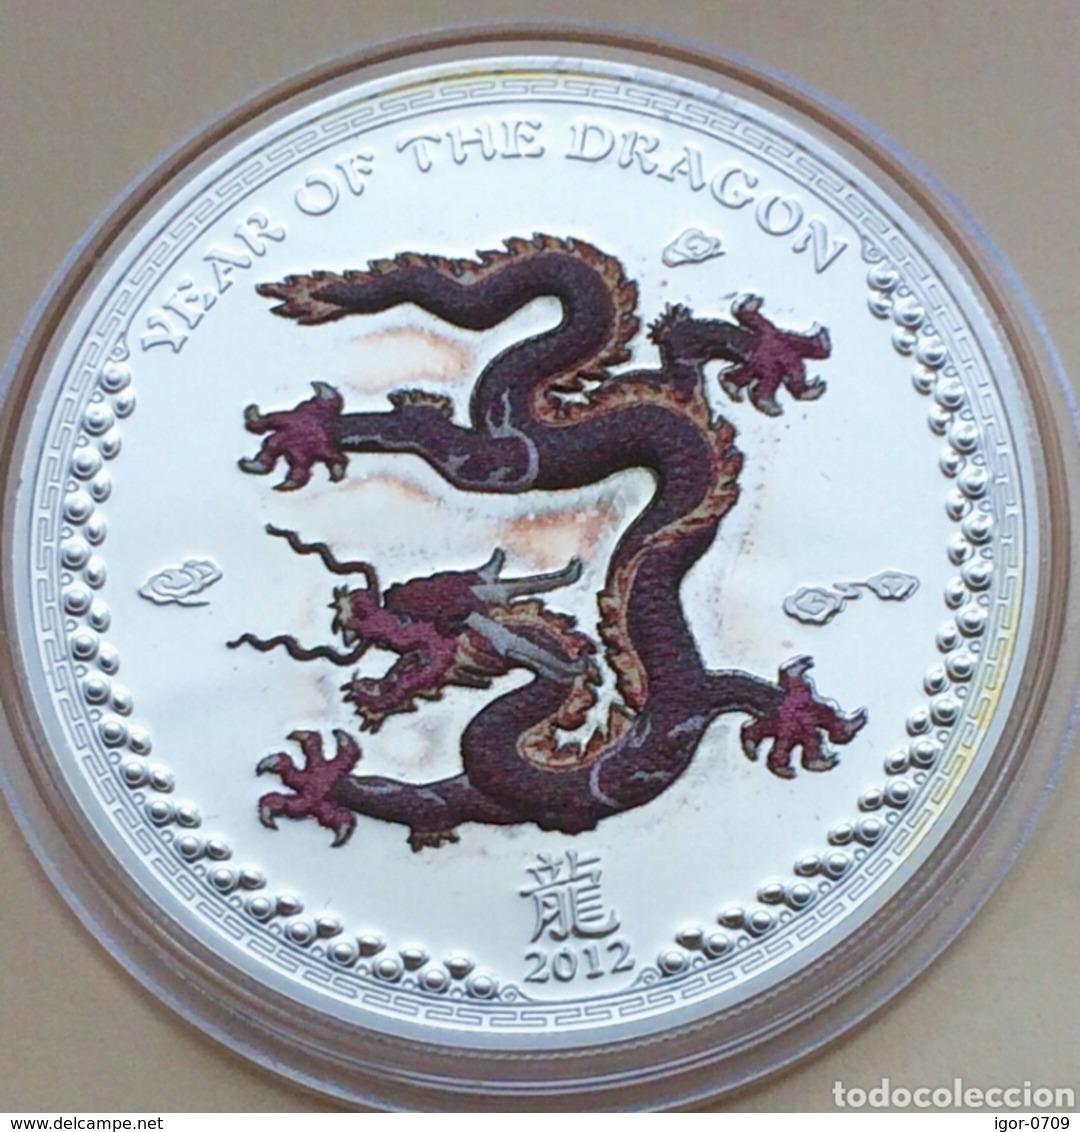 Palau 2012 Year Of Dragon 2 Coins Set. Proof Silver.Original Box And Coa - Palau